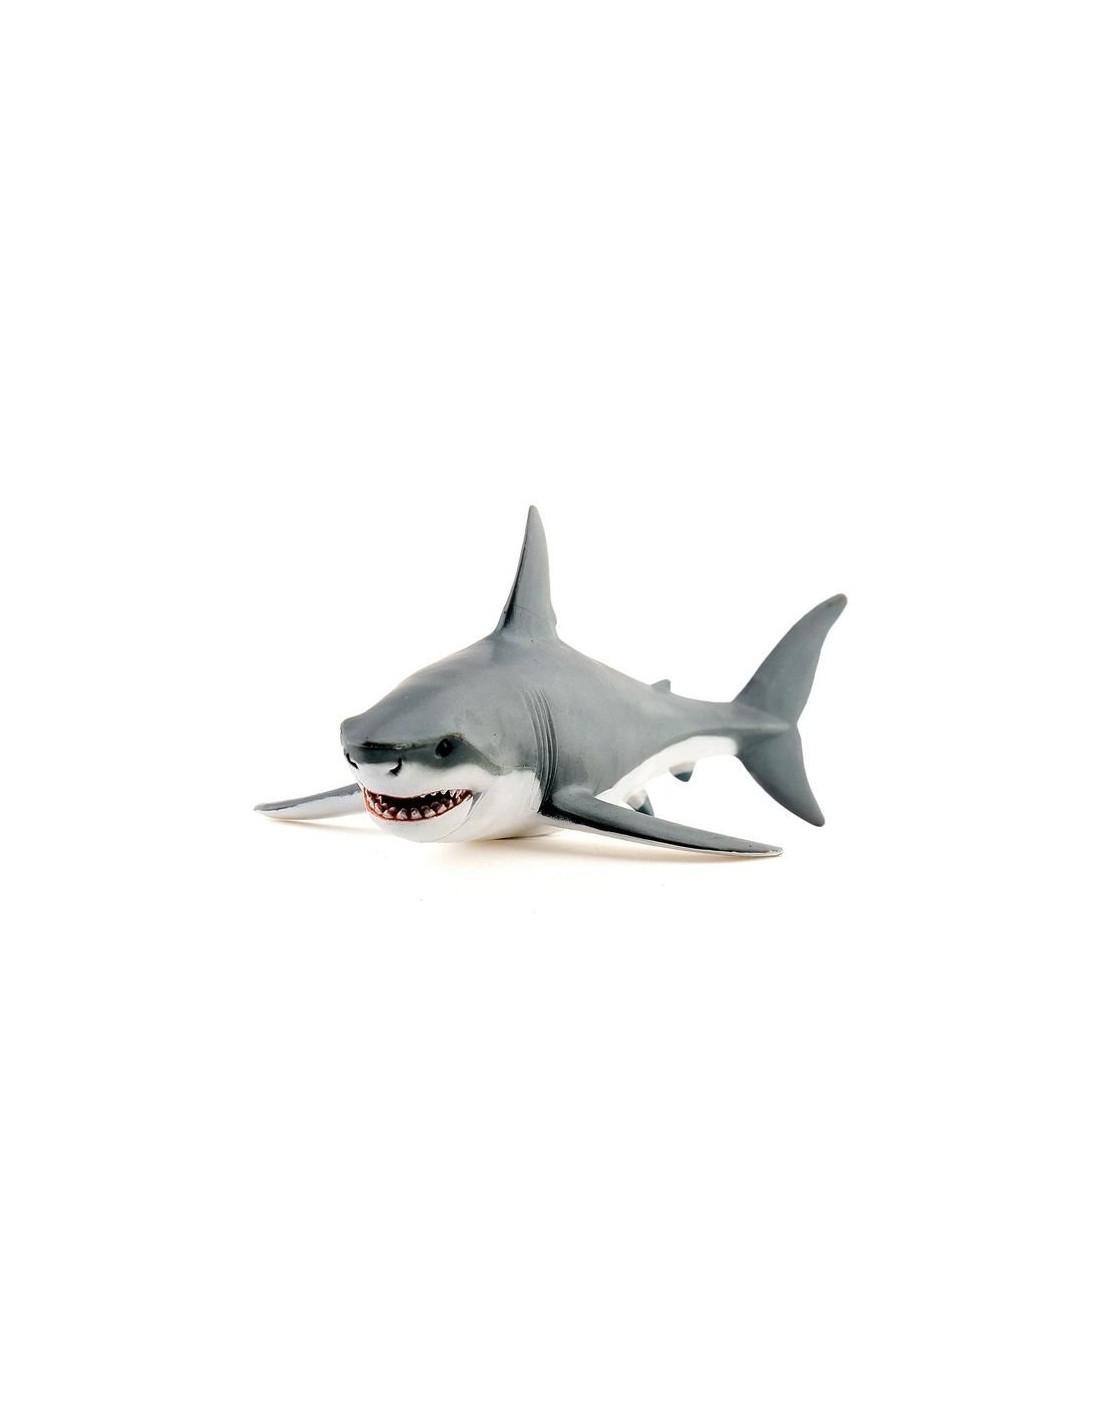 Figurine Requin Blanc - Papo avec Jeu De Societe Requin